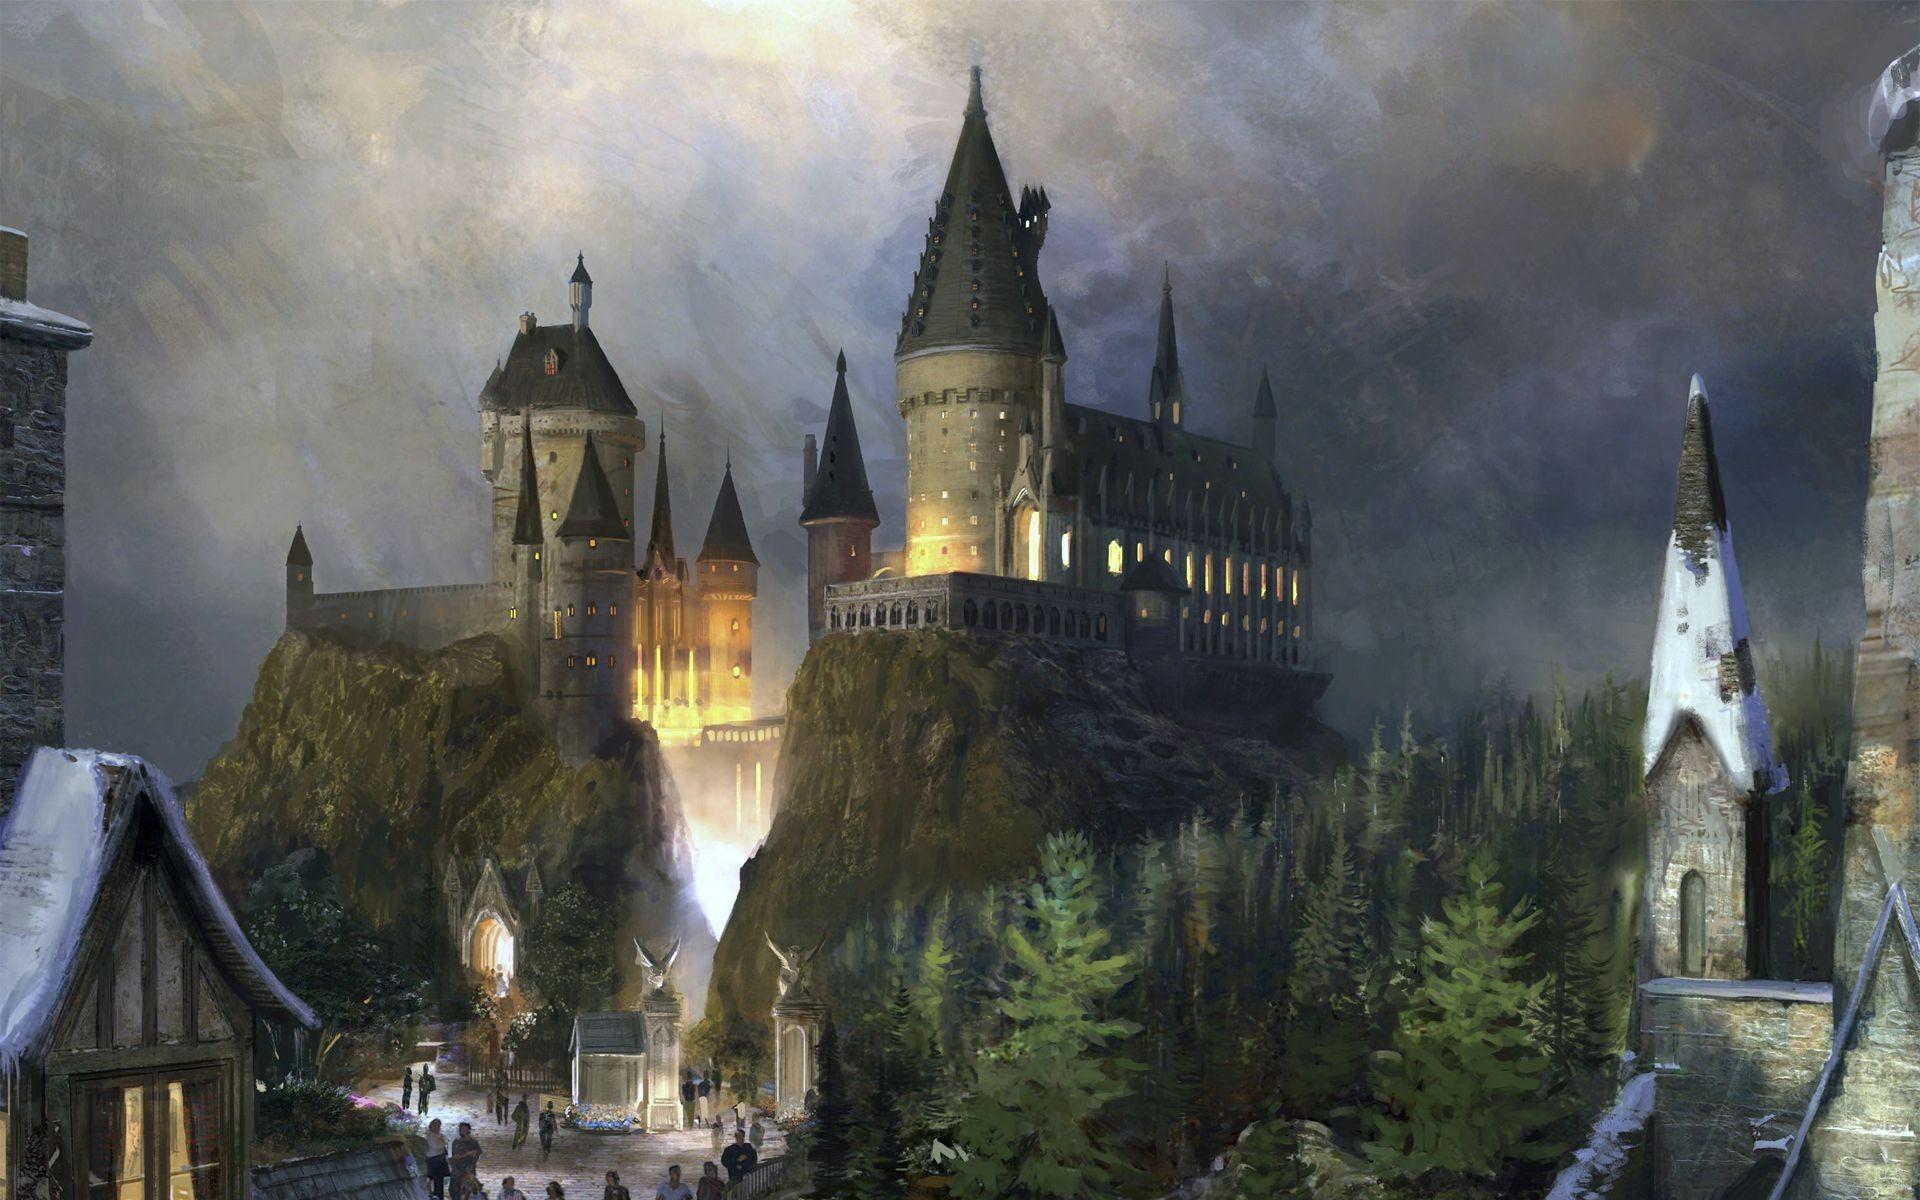 Harry Potter Desktop Wallpaper Hogwarts Harry Potter hd Wallpapers